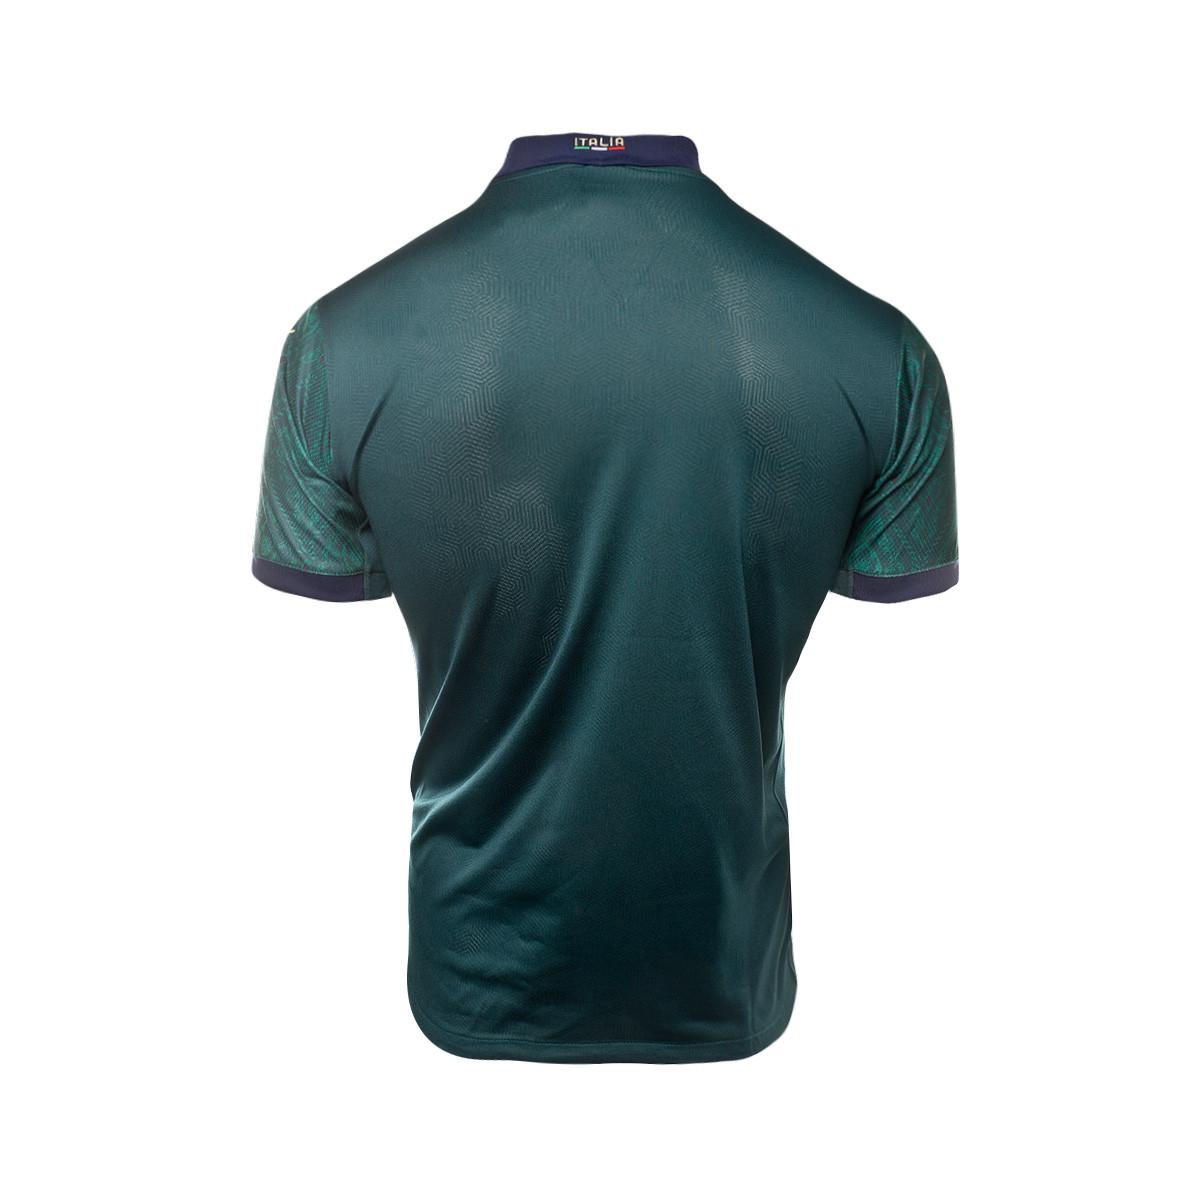 Prestigioso frijoles foso  Jersey Puma Italia Tercera Promo 2019-2020 Ponderosa Pine-Peacoat -  Football store Fútbol Emotion